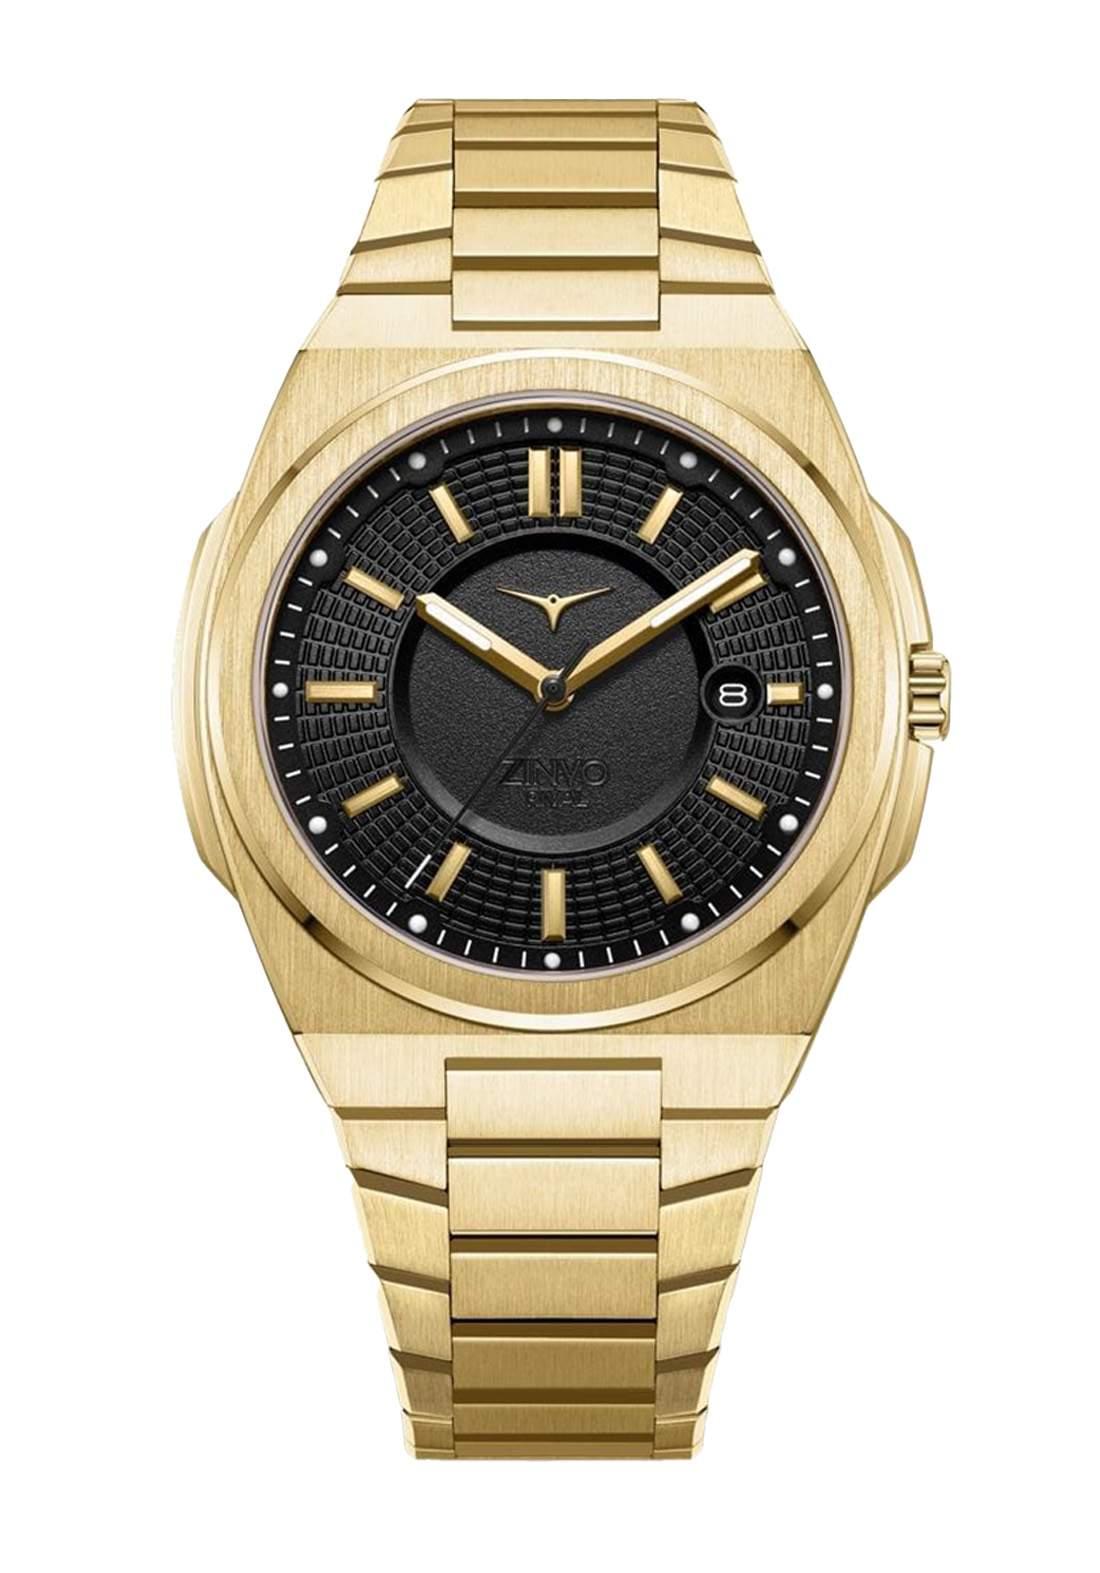 Zinvo Rival Watch For Men - Gold  ساعة رجالي